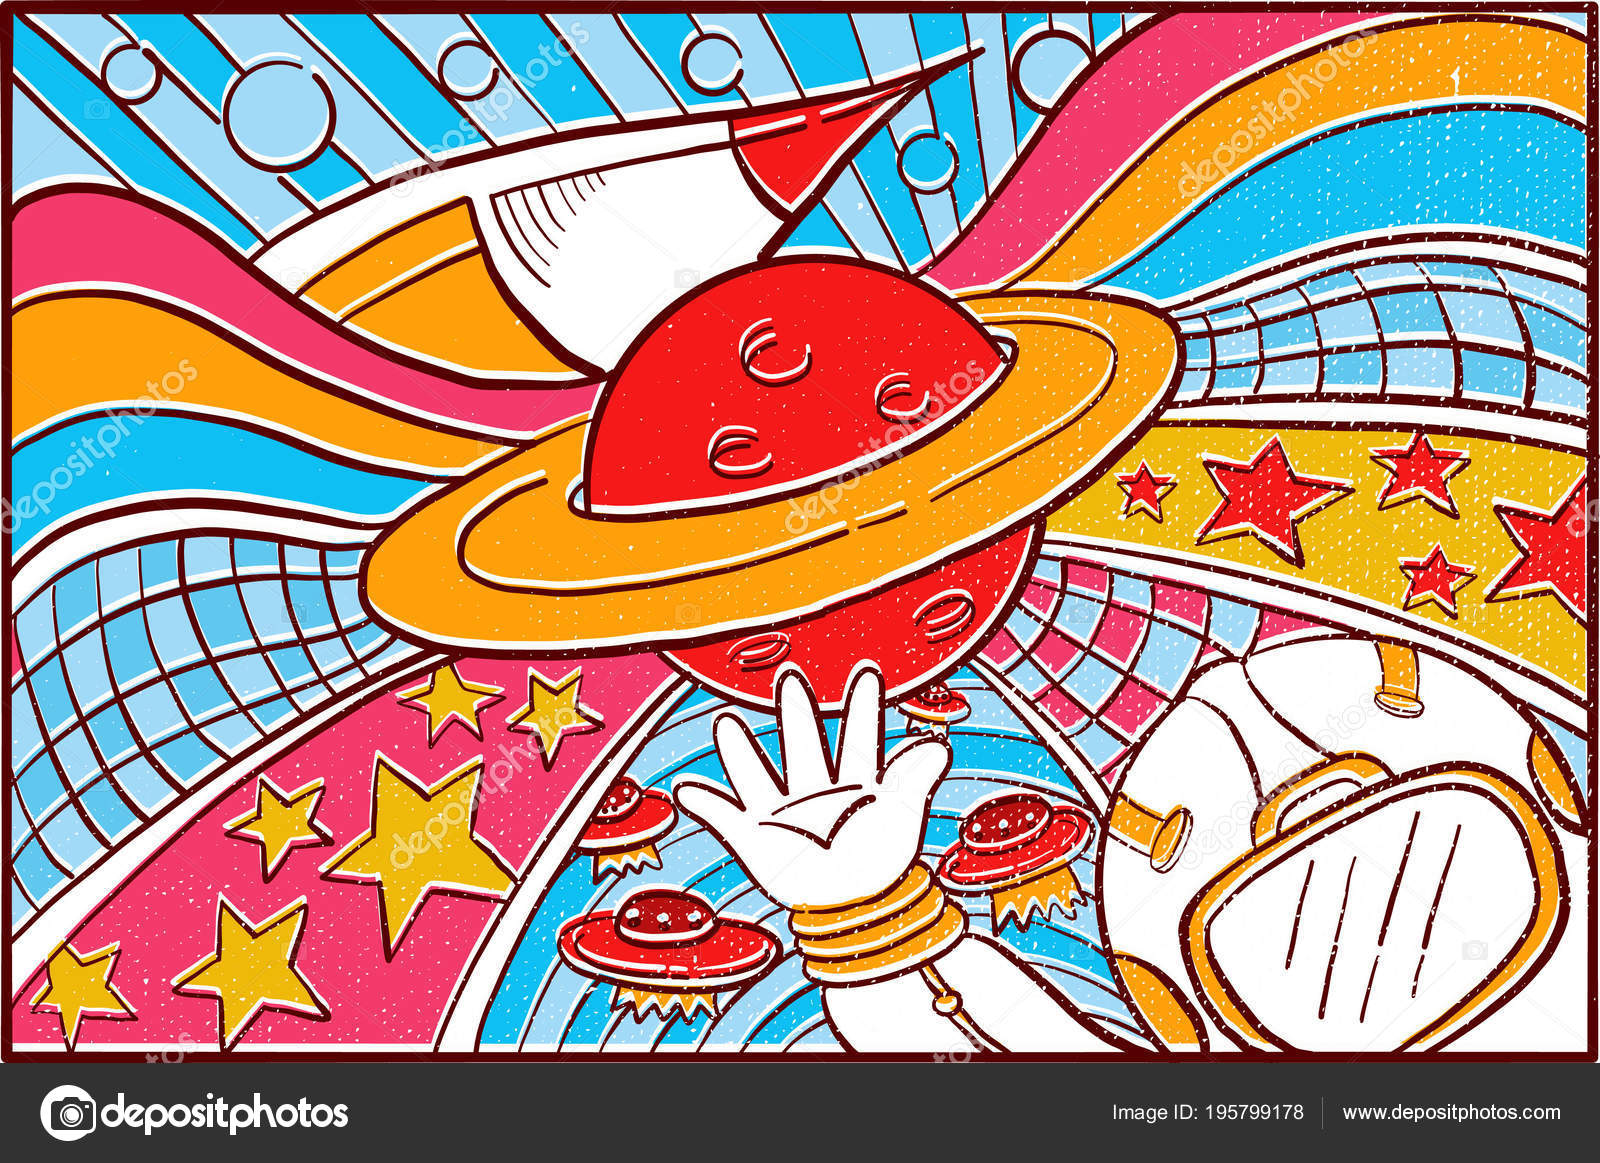 Hand Drawn Pop Art Wallpaper Mosaic Background Space Theme Rocket